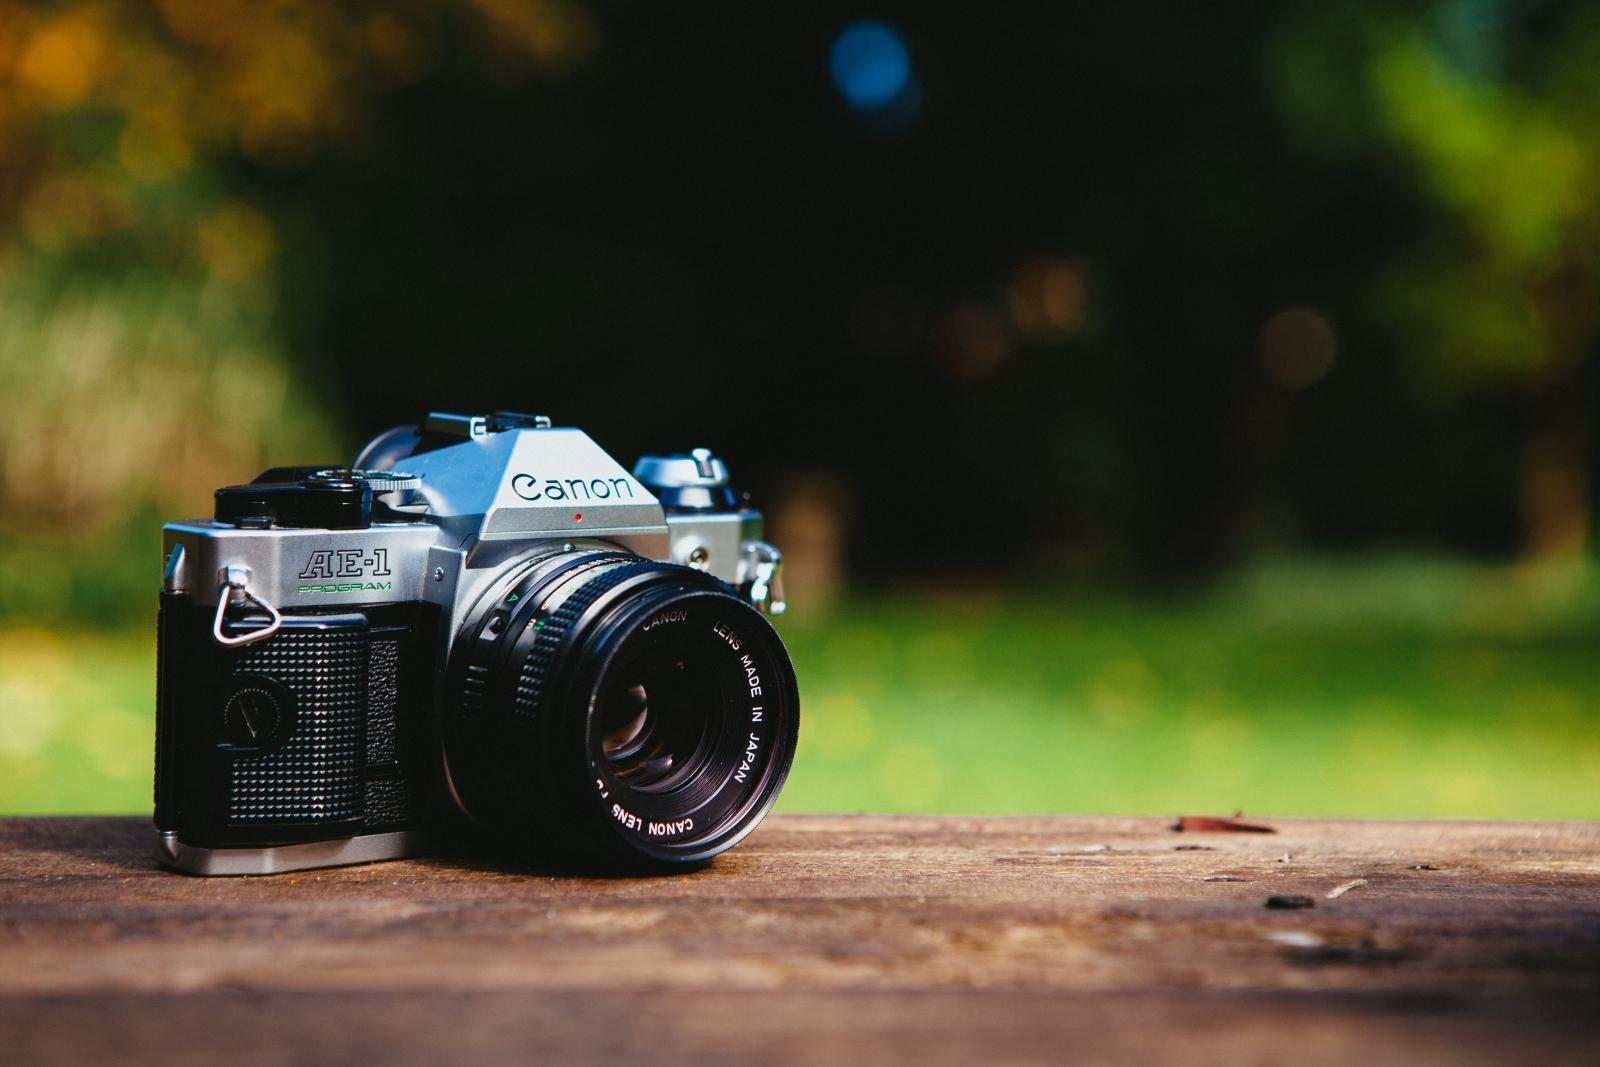 Camera. Photo credit: pexels